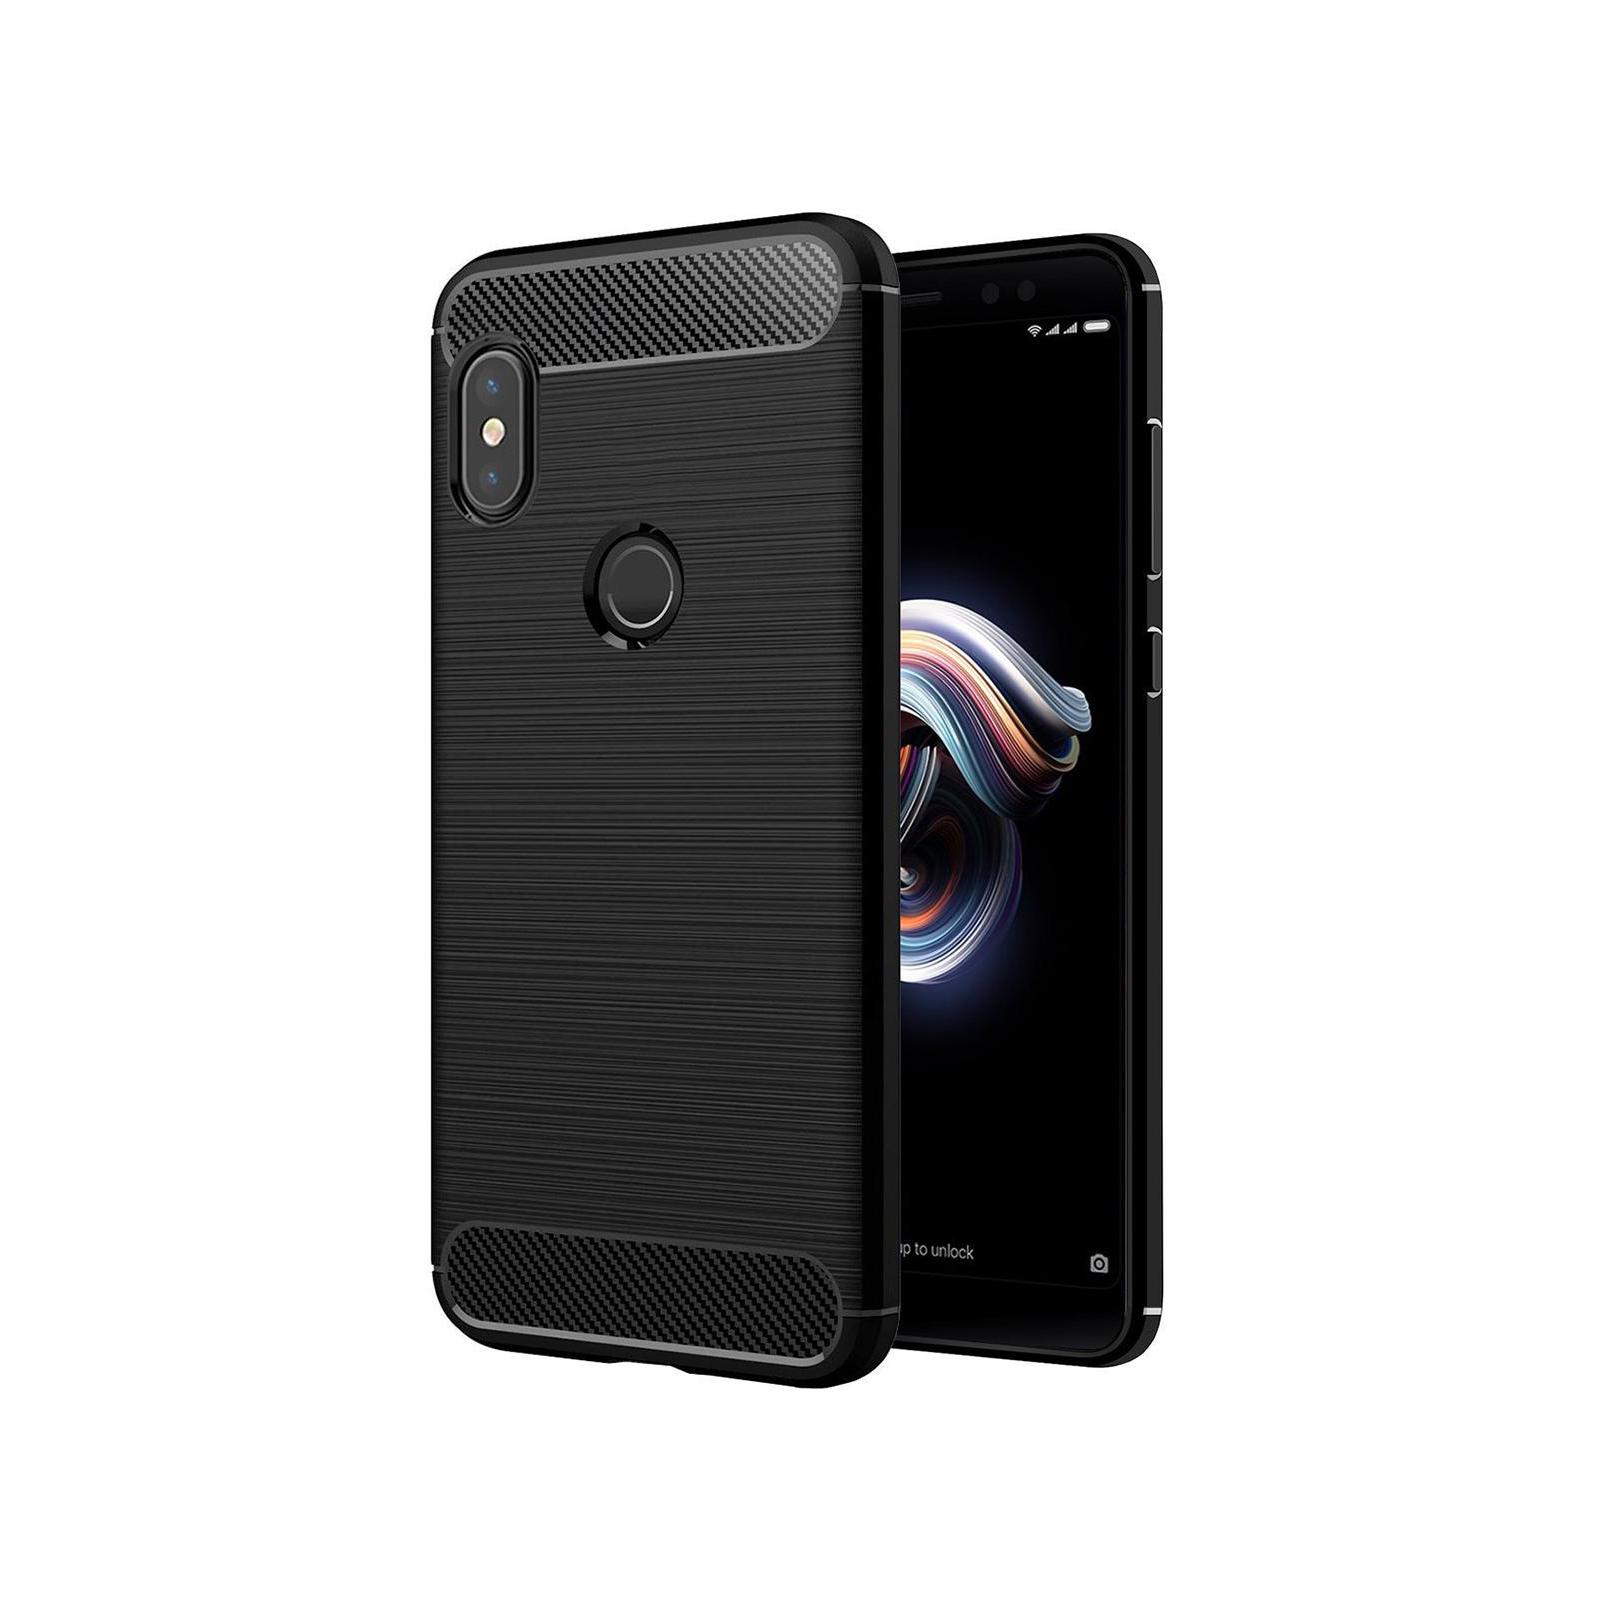 Чехол для моб. телефона Laudtec для XiaomiRedmi Note 5 Pro Carbon Fiber (Black) (LT-RN5PB)